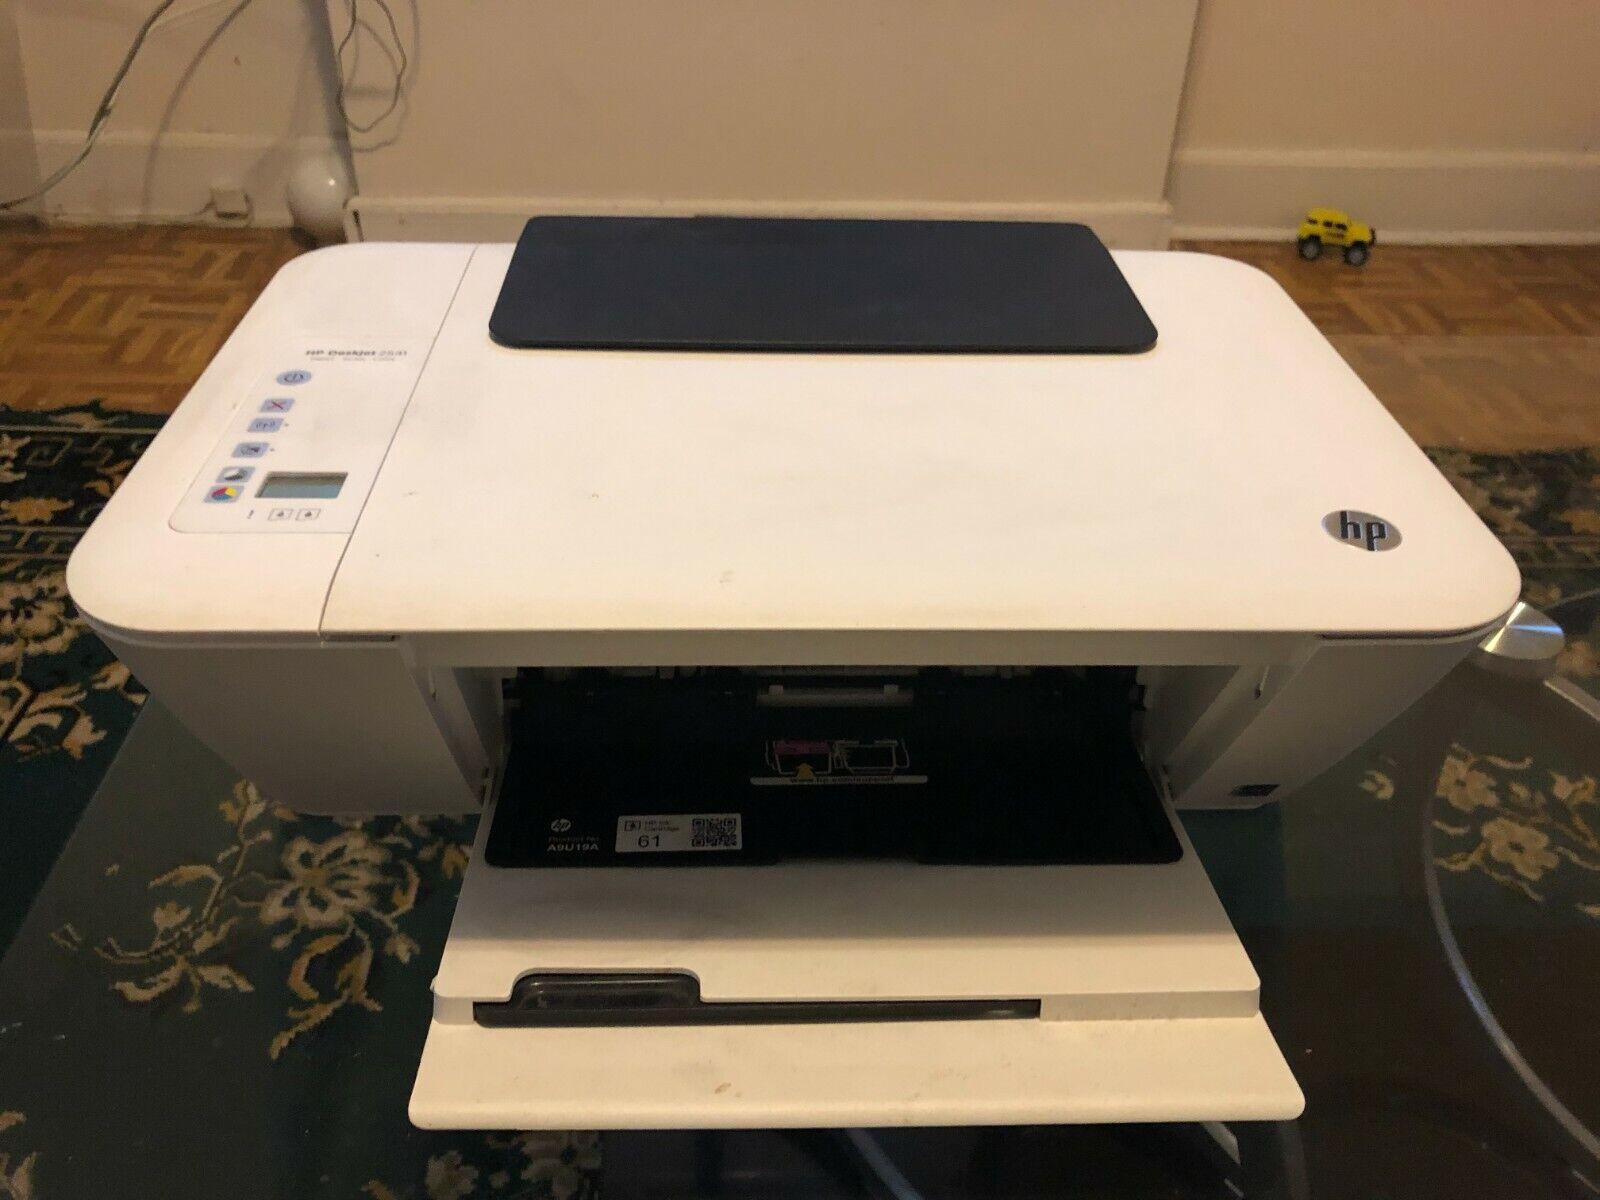 HP Deskjet 2541  works great, Accessories for printers